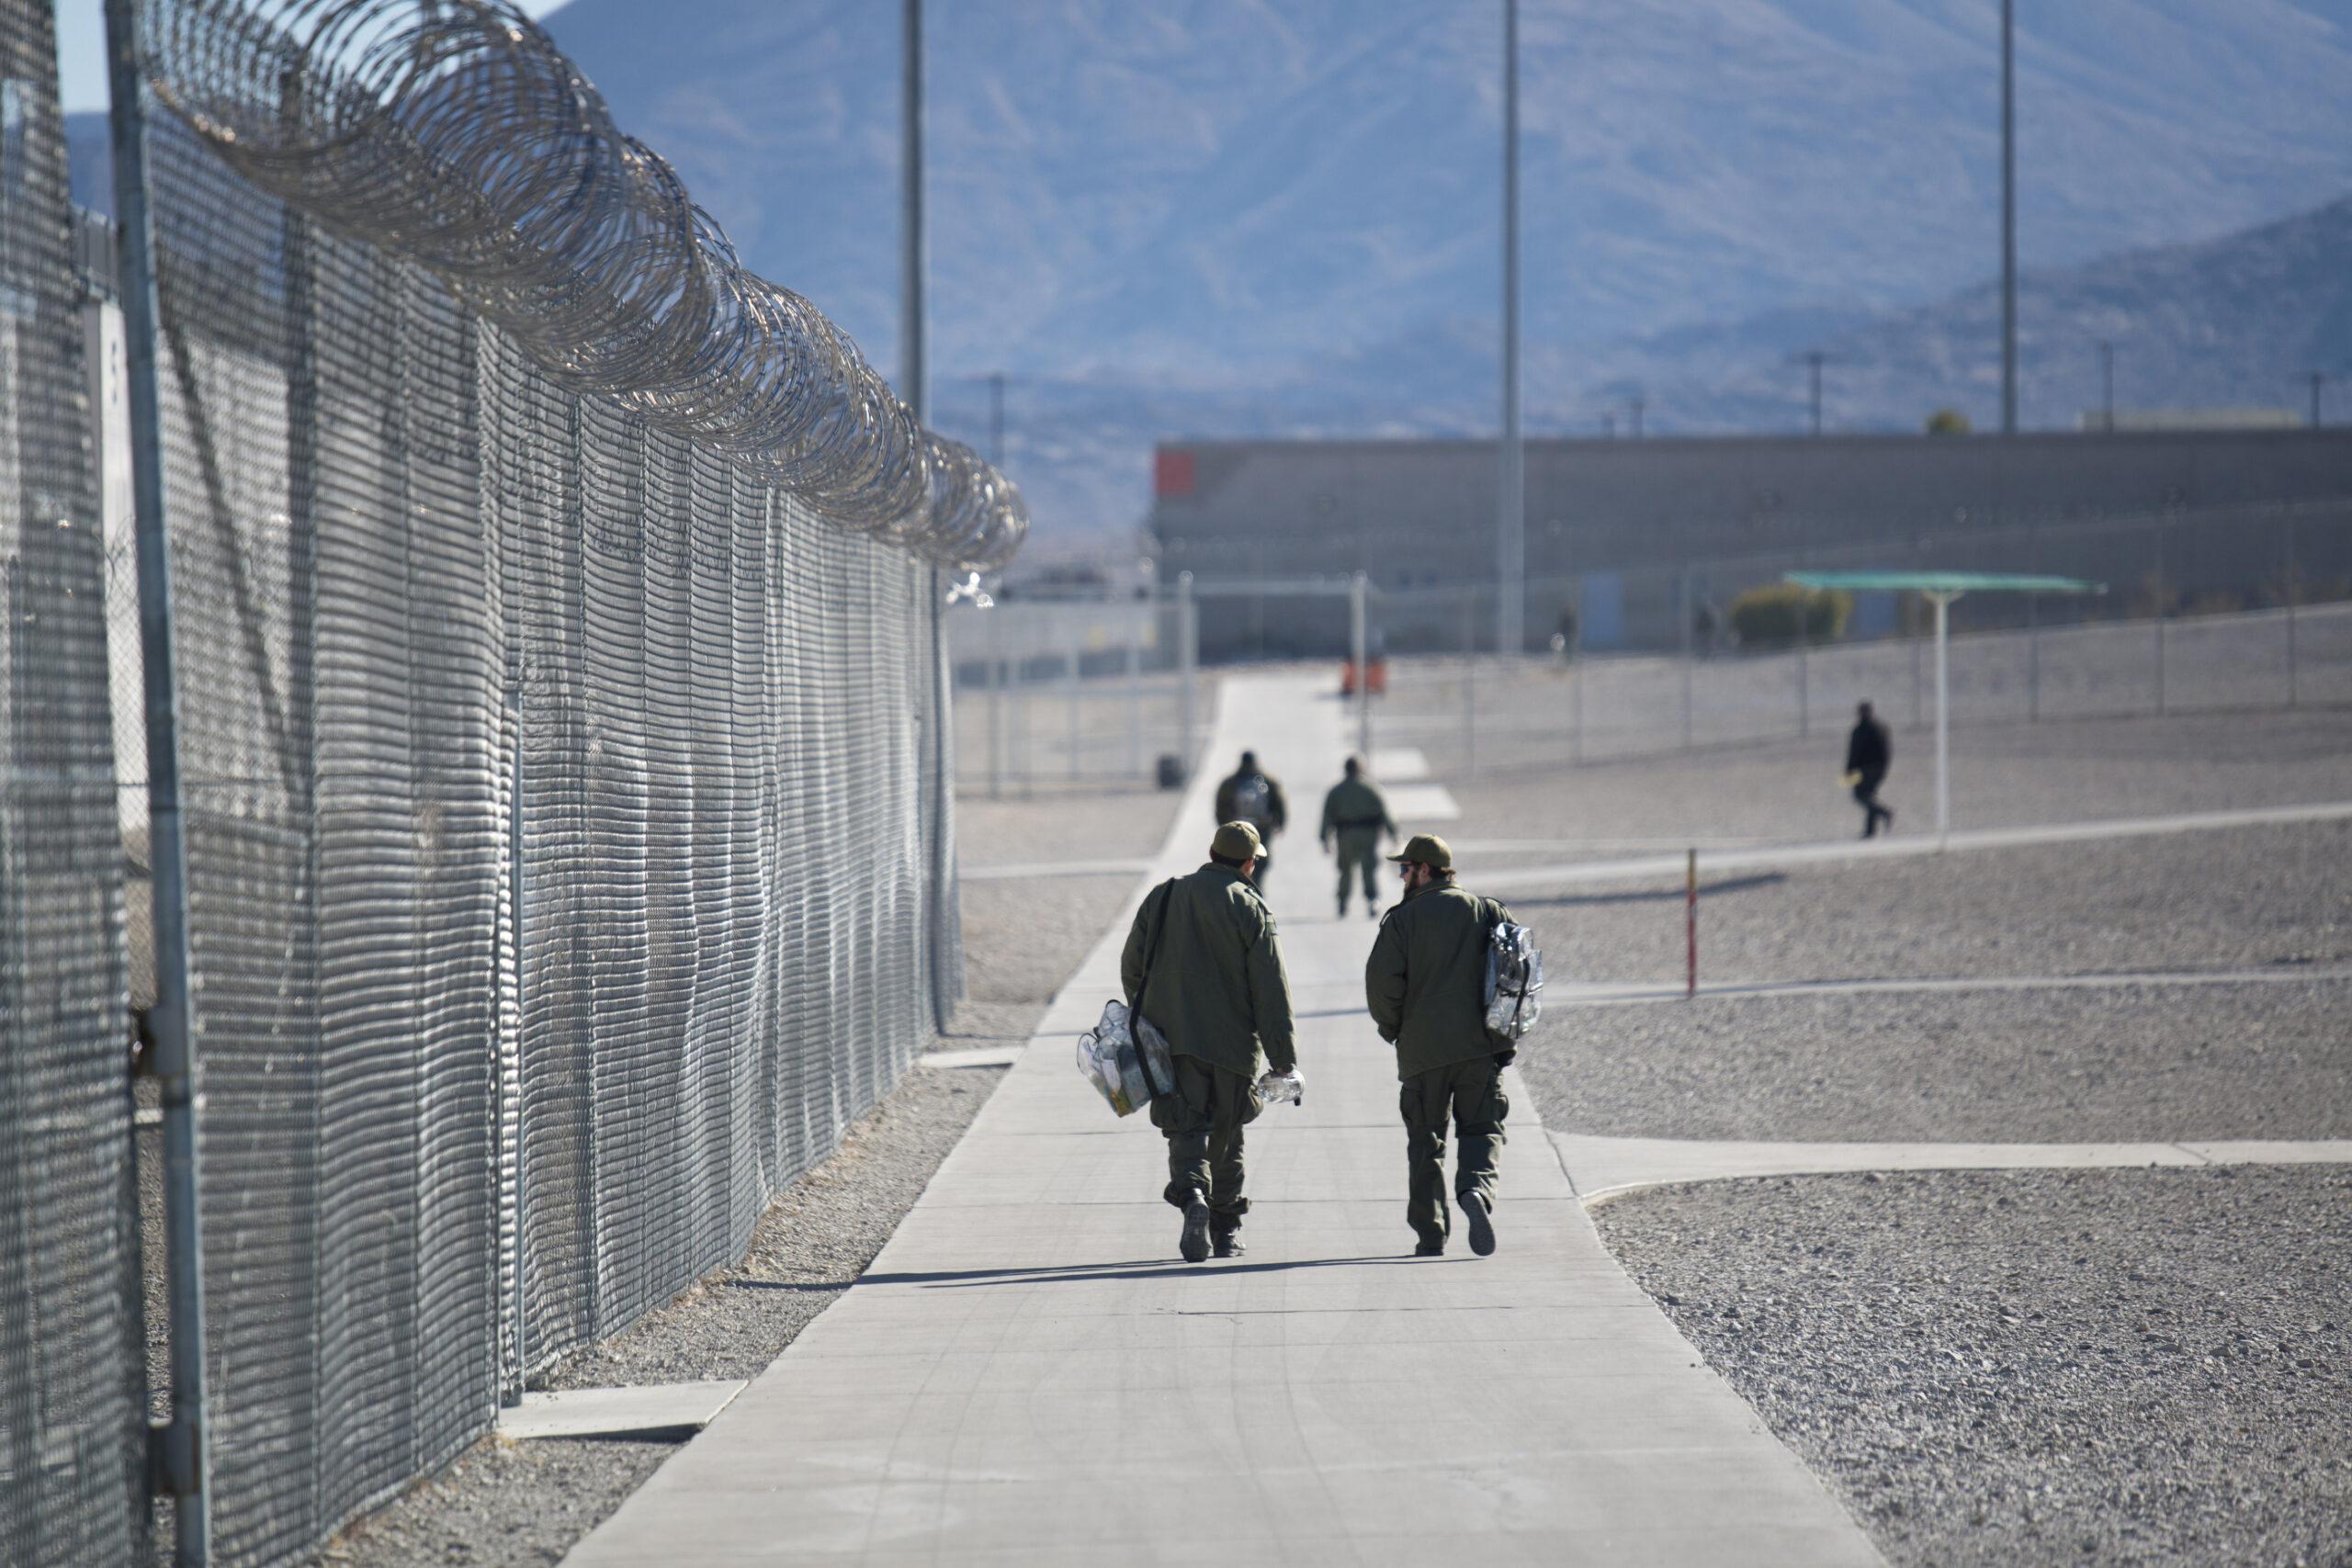 Guards walk inside High Desert State Prison as seen on Friday, Jan. 4, 2019.